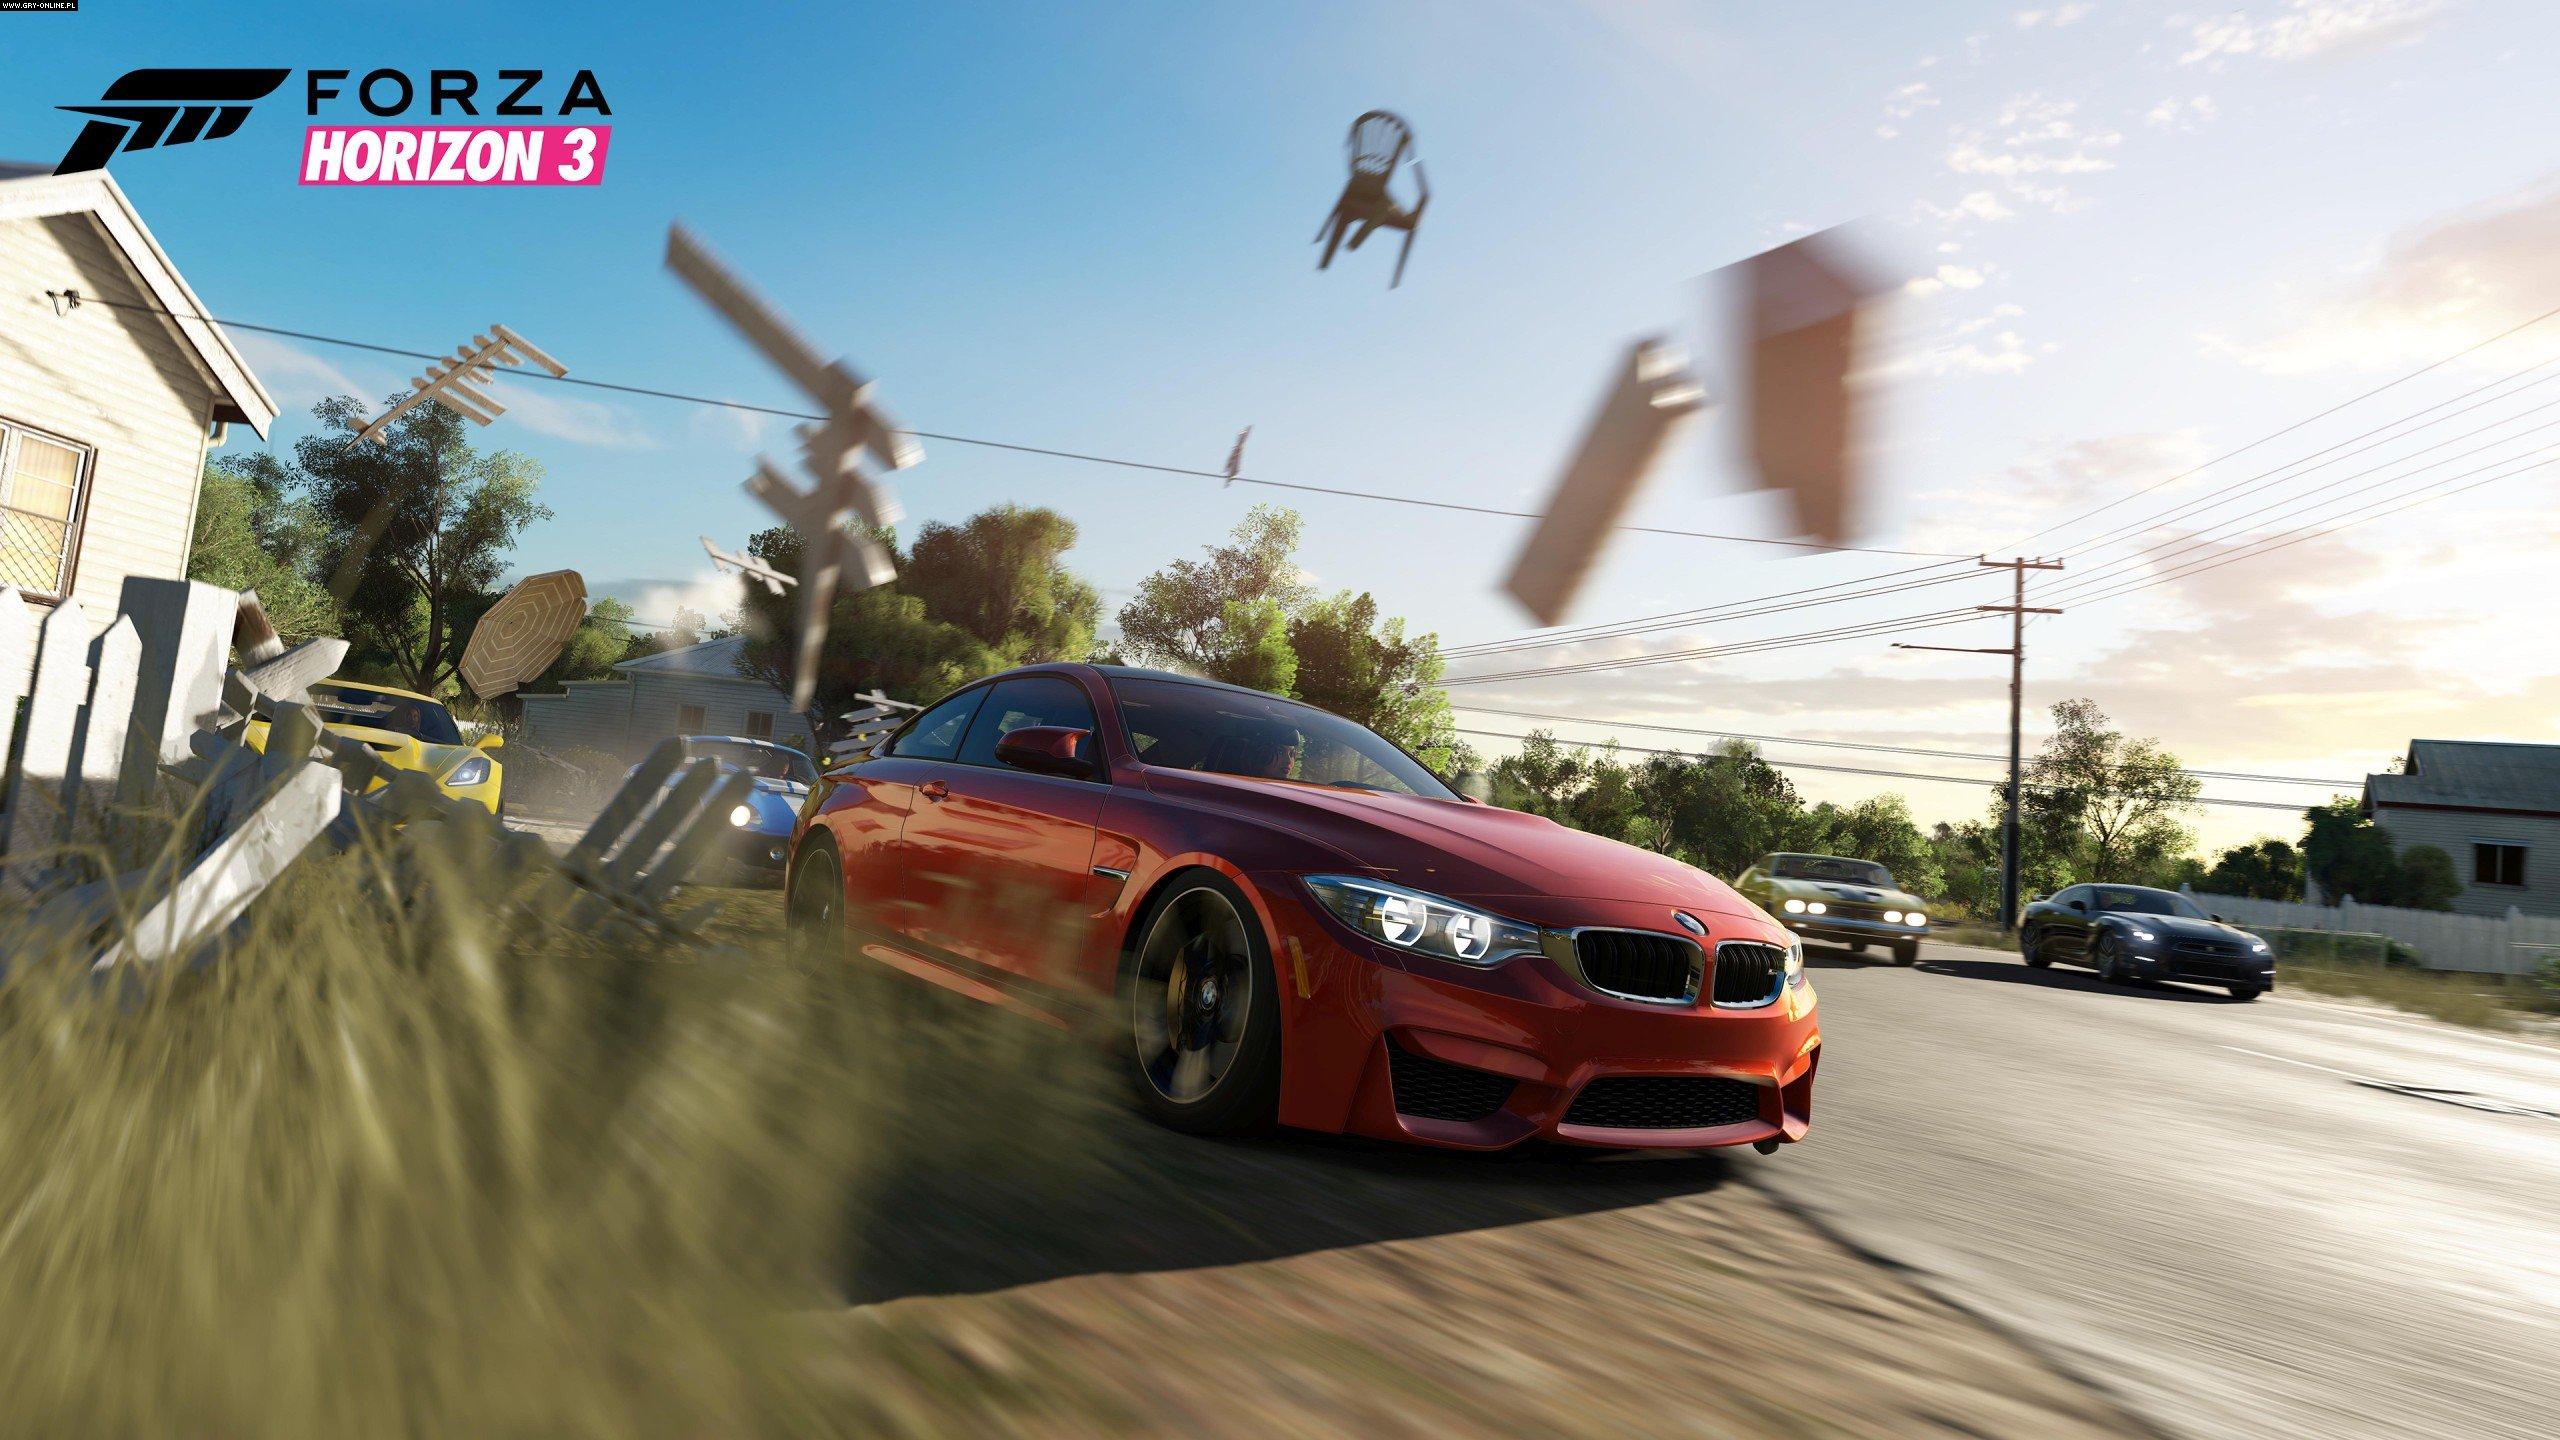 Forza Horizon 3 PC, XONE Games Image 3/11, Playground Games, Microsoft Studios